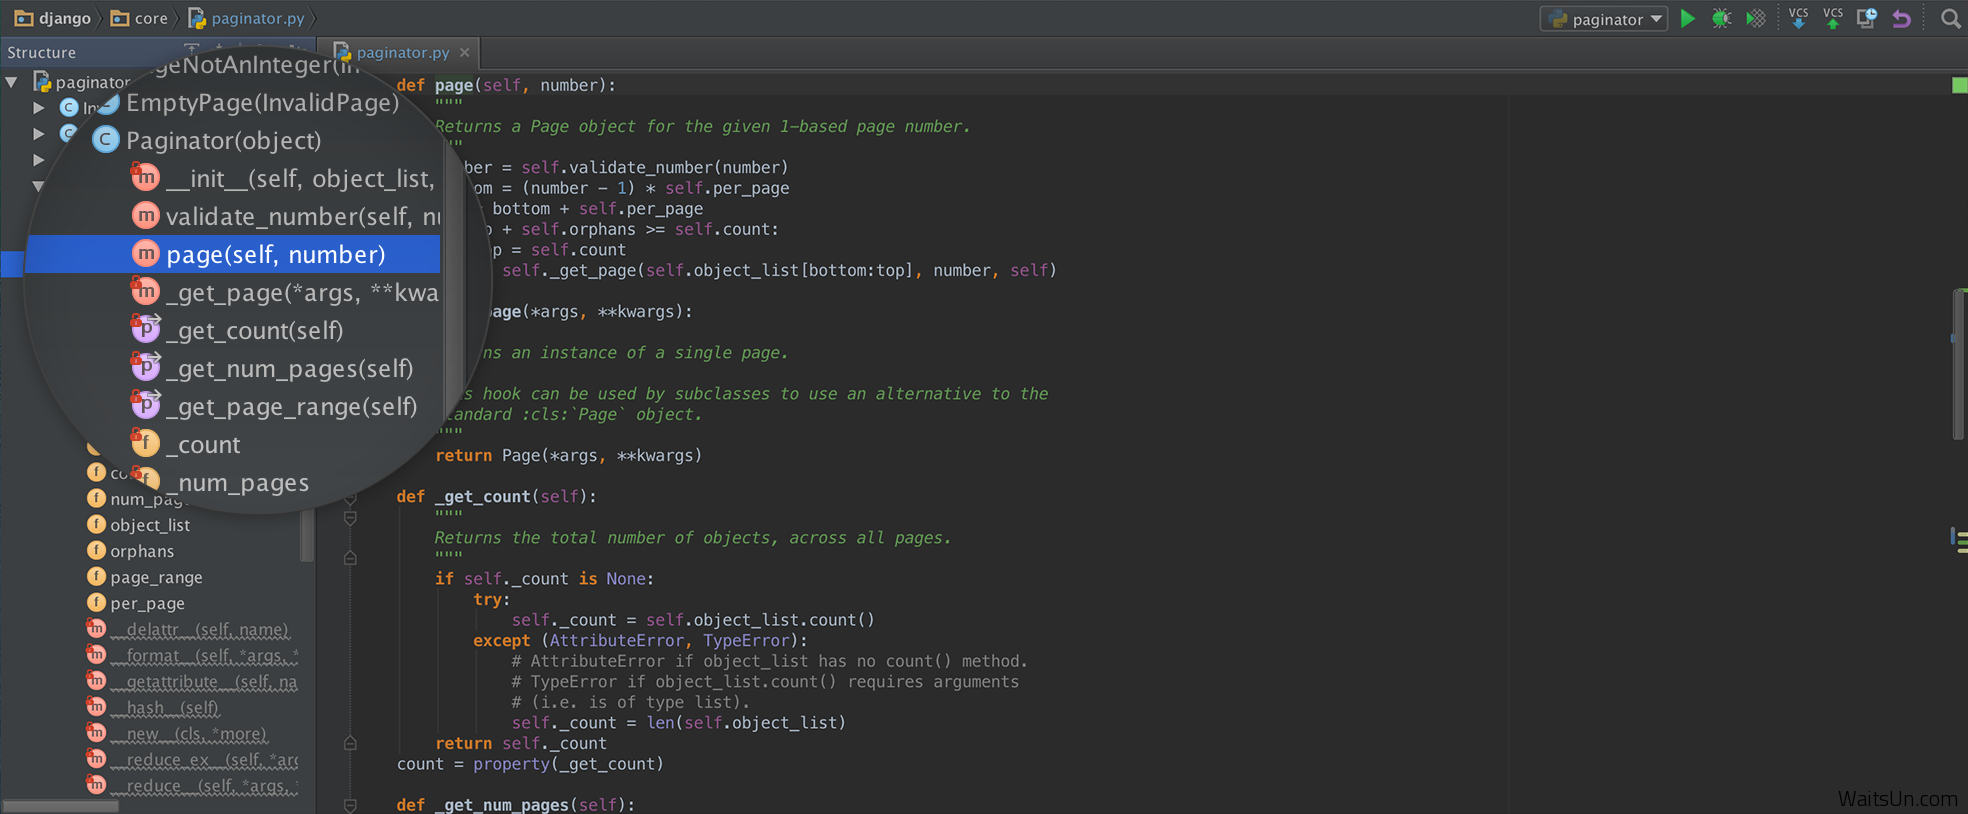 JetBrains PyCharm Professional for Mac 4.5.2 破解版 – Mac上强大的Python编程工具-麦氪搜(iMacso.com)